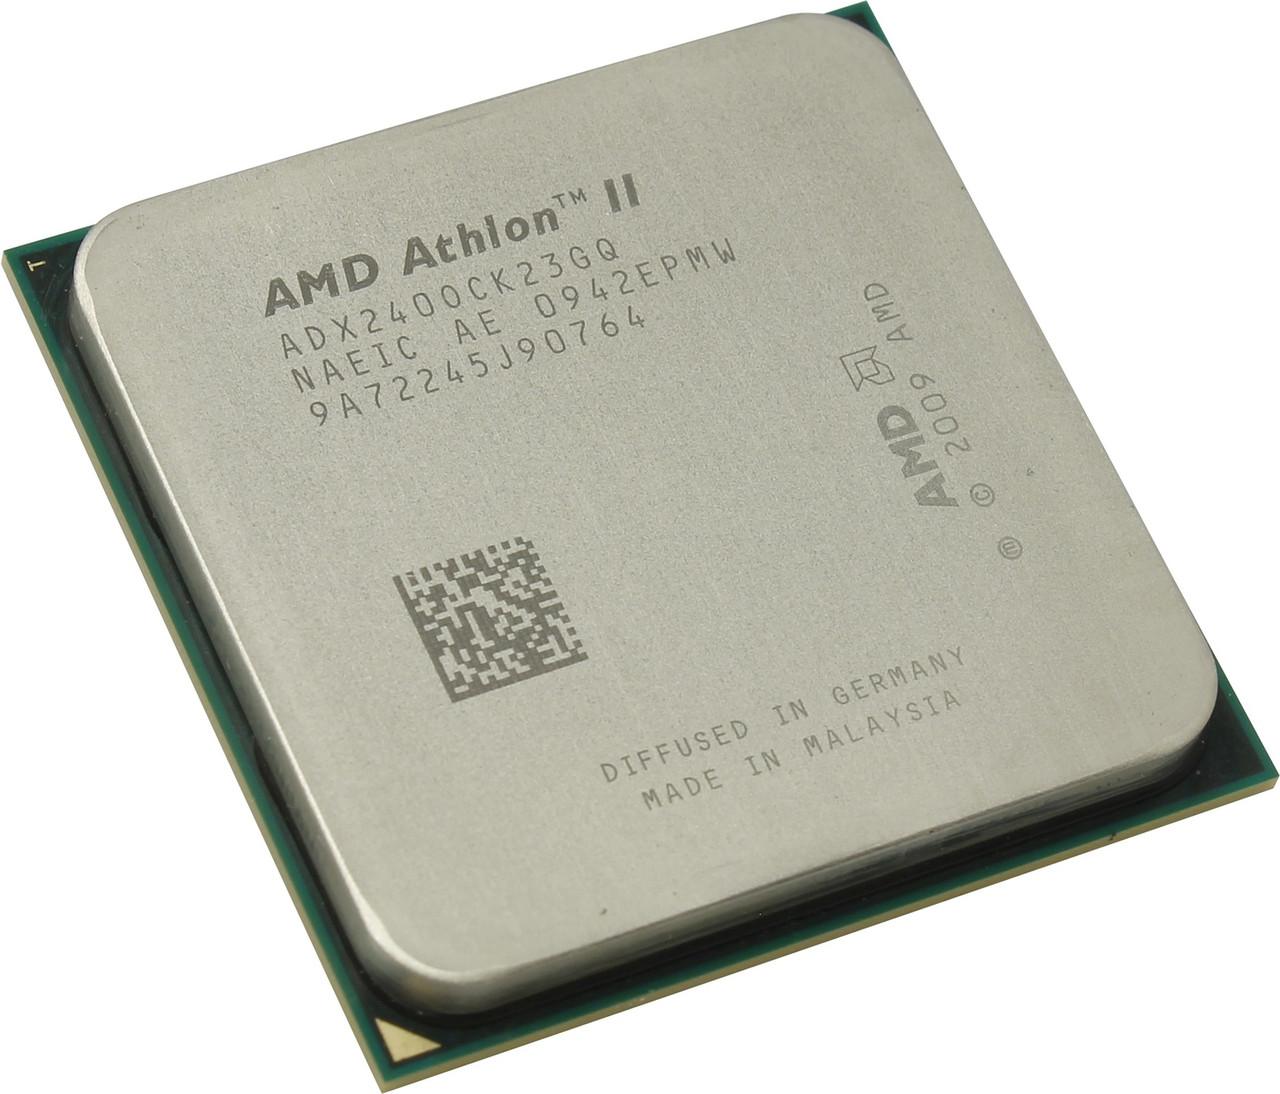 Процессор AMD Athlon II X2 240 (ADX2400) 2,8 GHz/2core/ 2Mb/65W/ 4000MHz Socket AM3